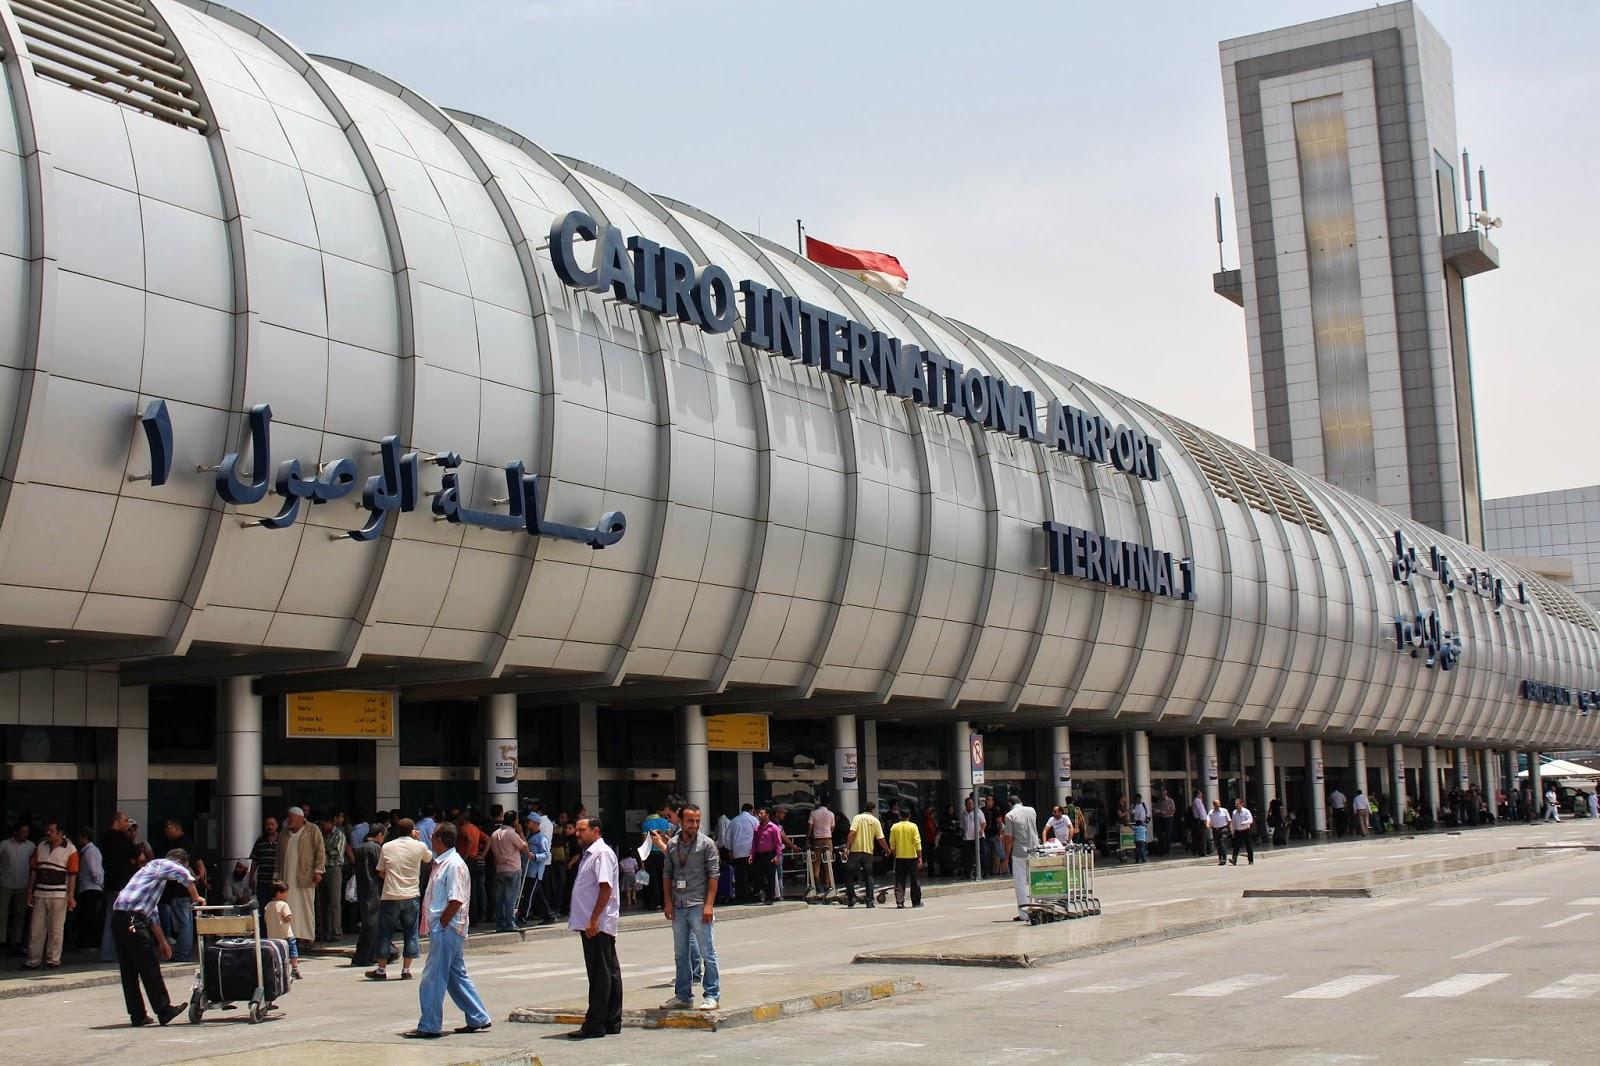 Aeroporto Do : Aeroporto do guarujá